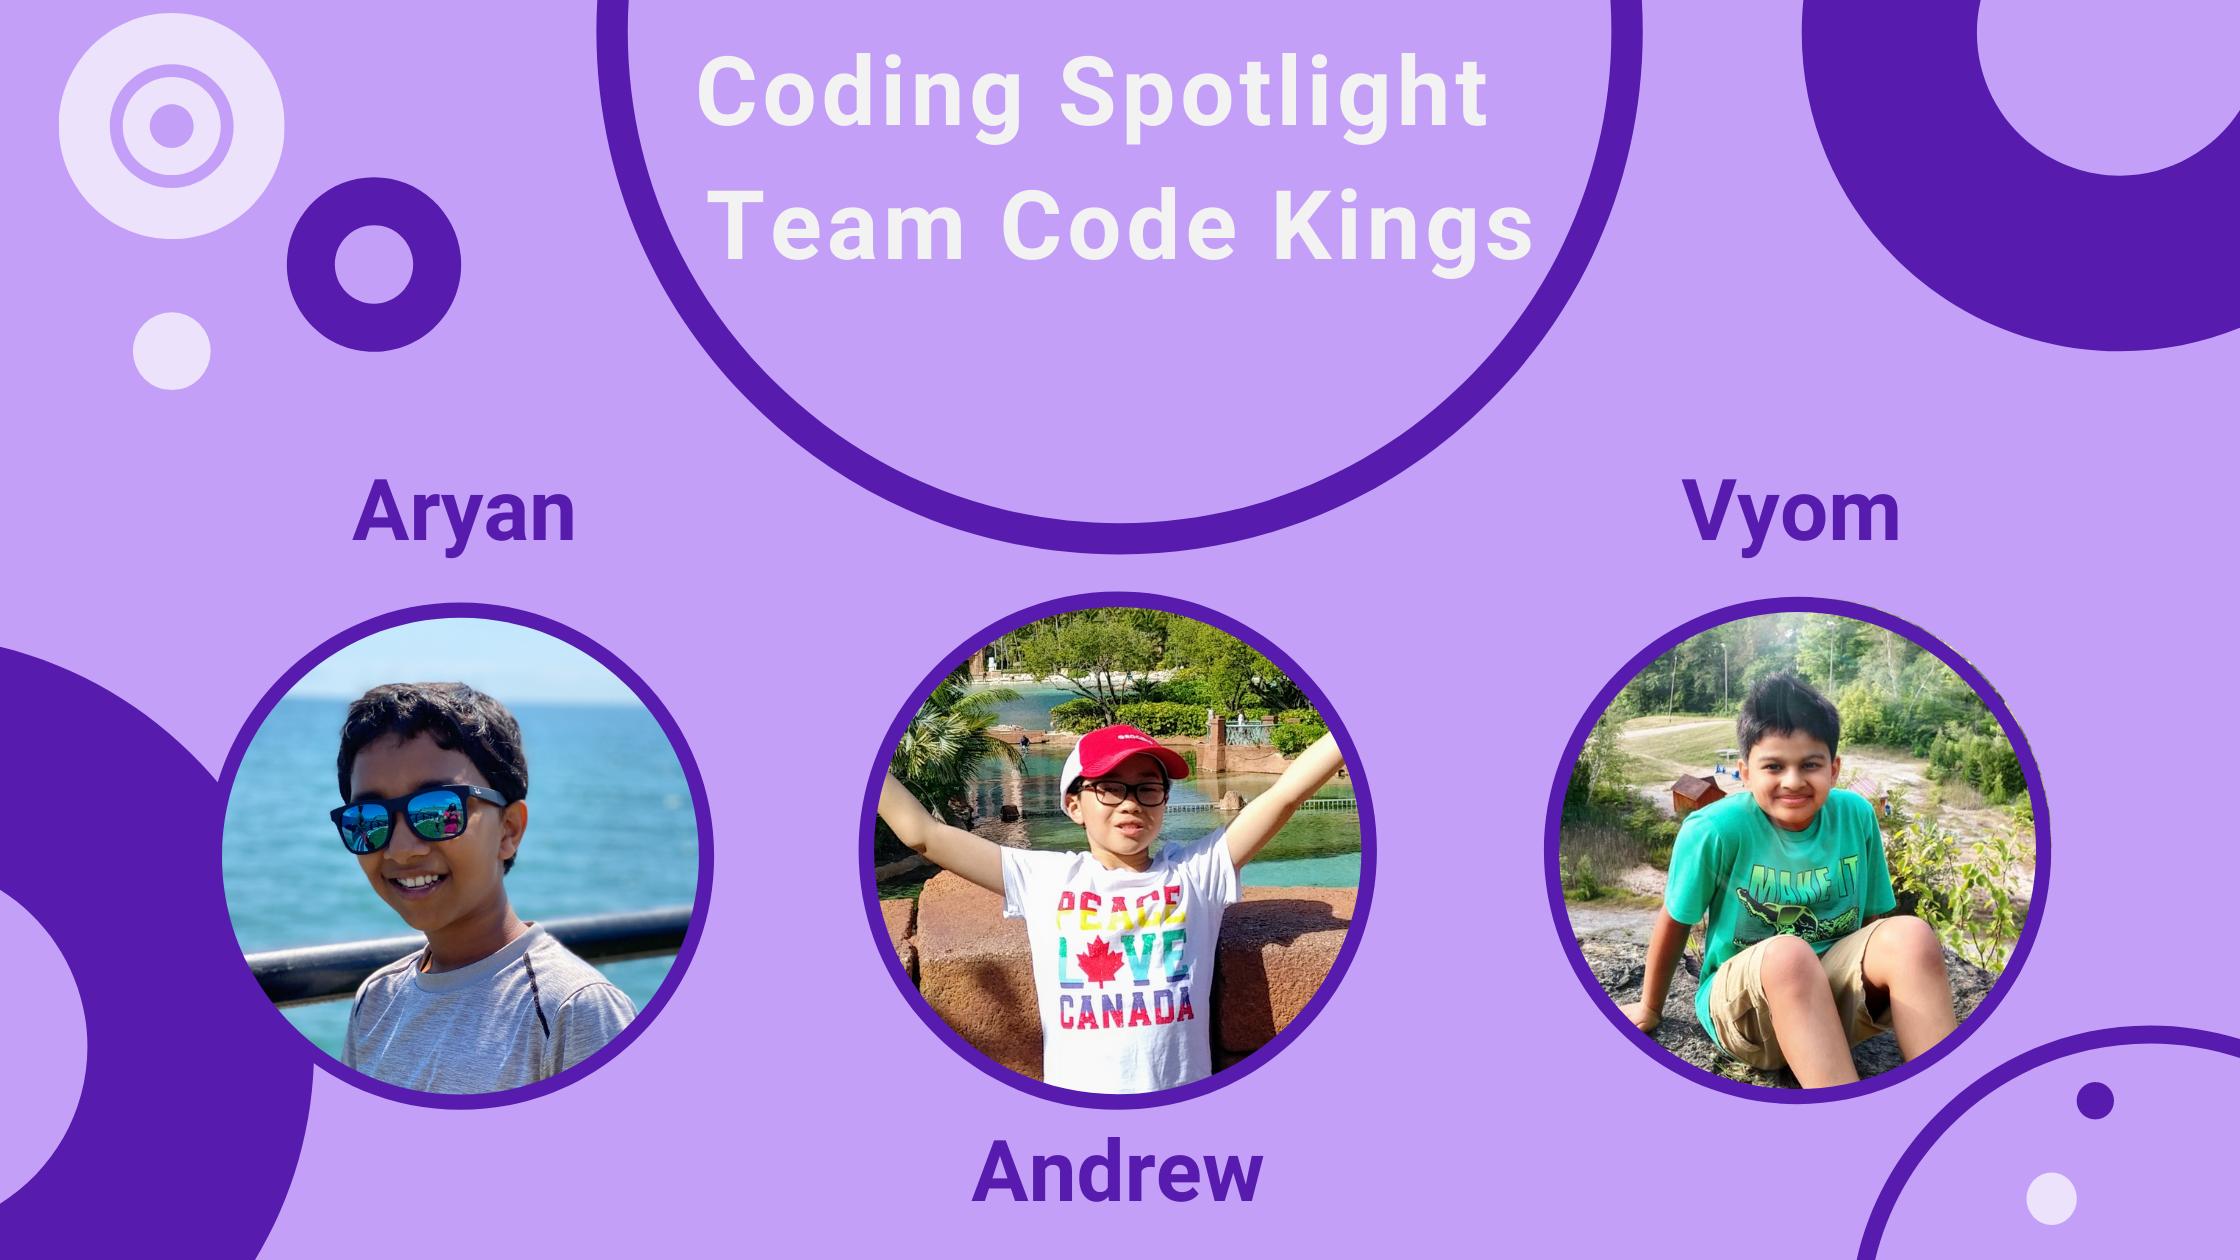 Team Code Kings - Aryan, Andrew & Vyom